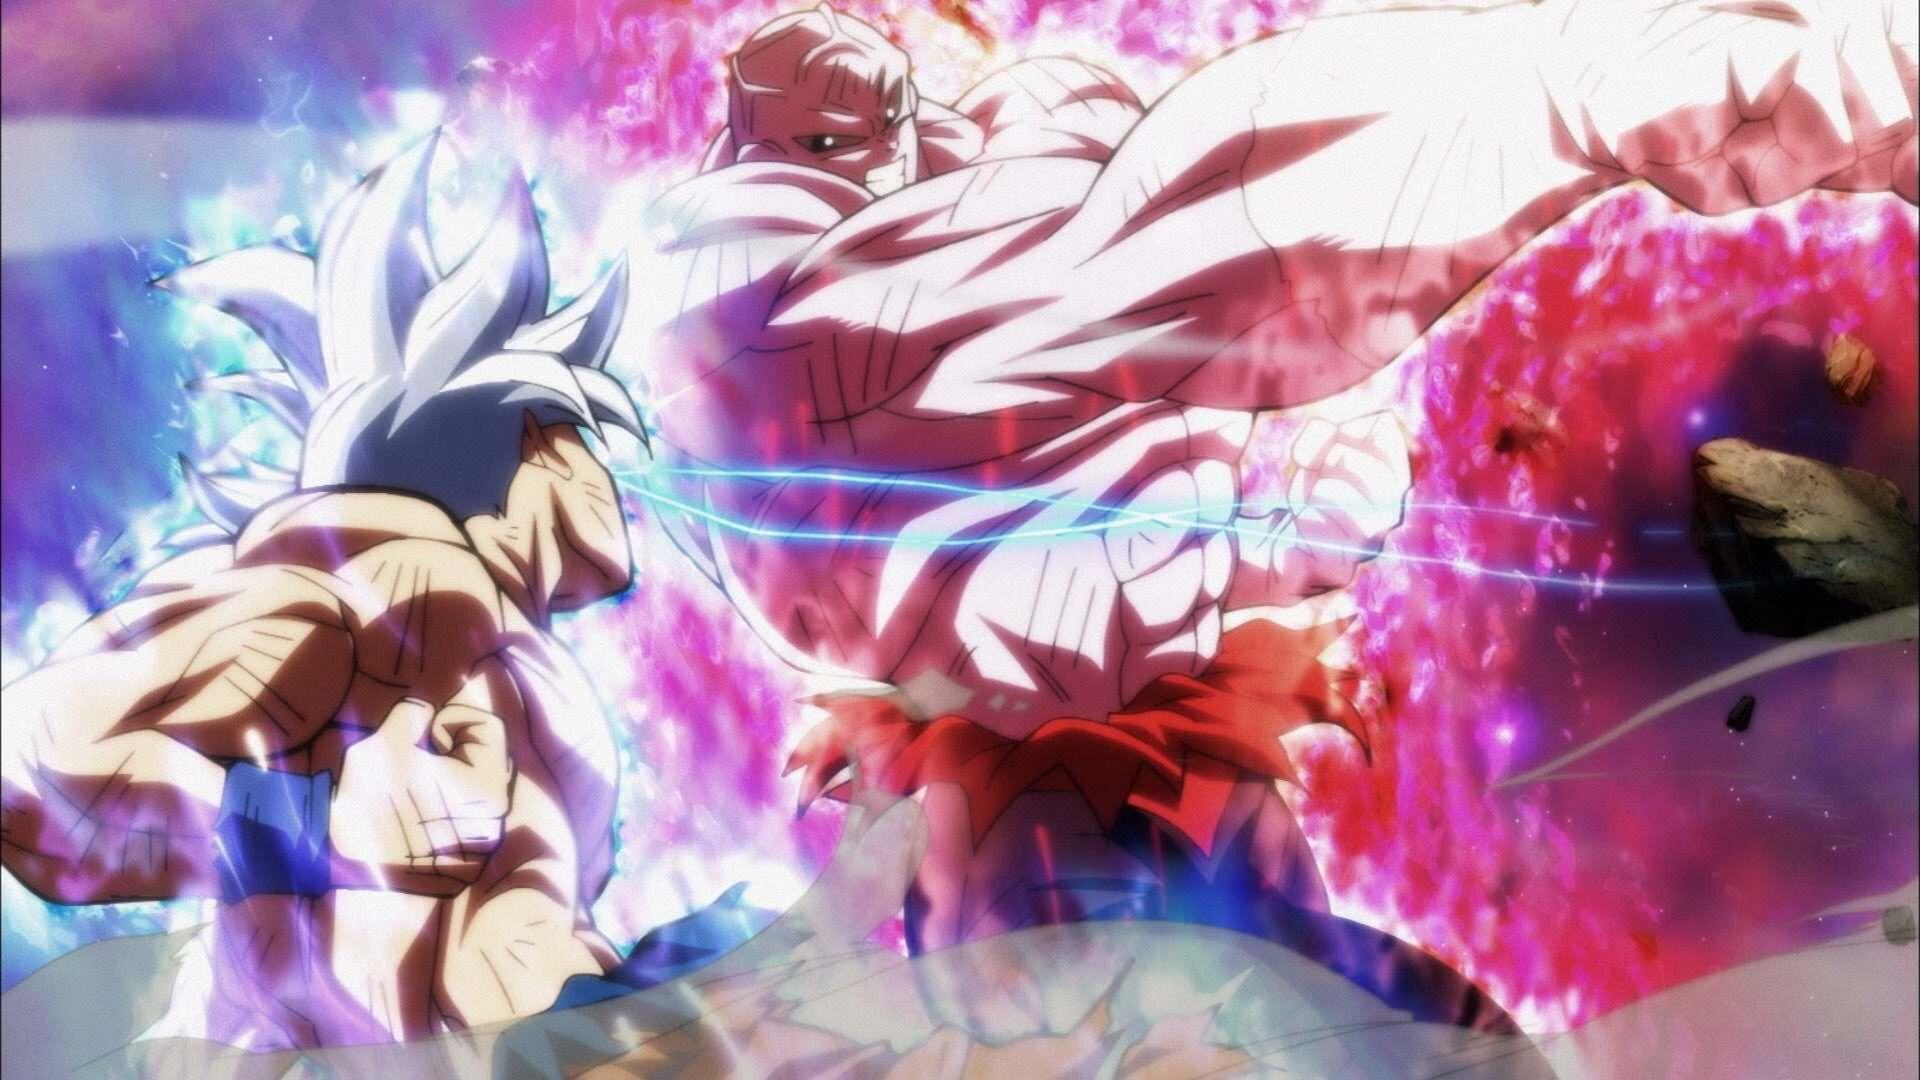 Dragon Ball Dragon Ball Super Son Goku Ultra Instict Mastered Ultra Instinct Jiren Rmehedi Dragon Ball Super Artwork Dragon Ball Super Goku Dragon Ball Super